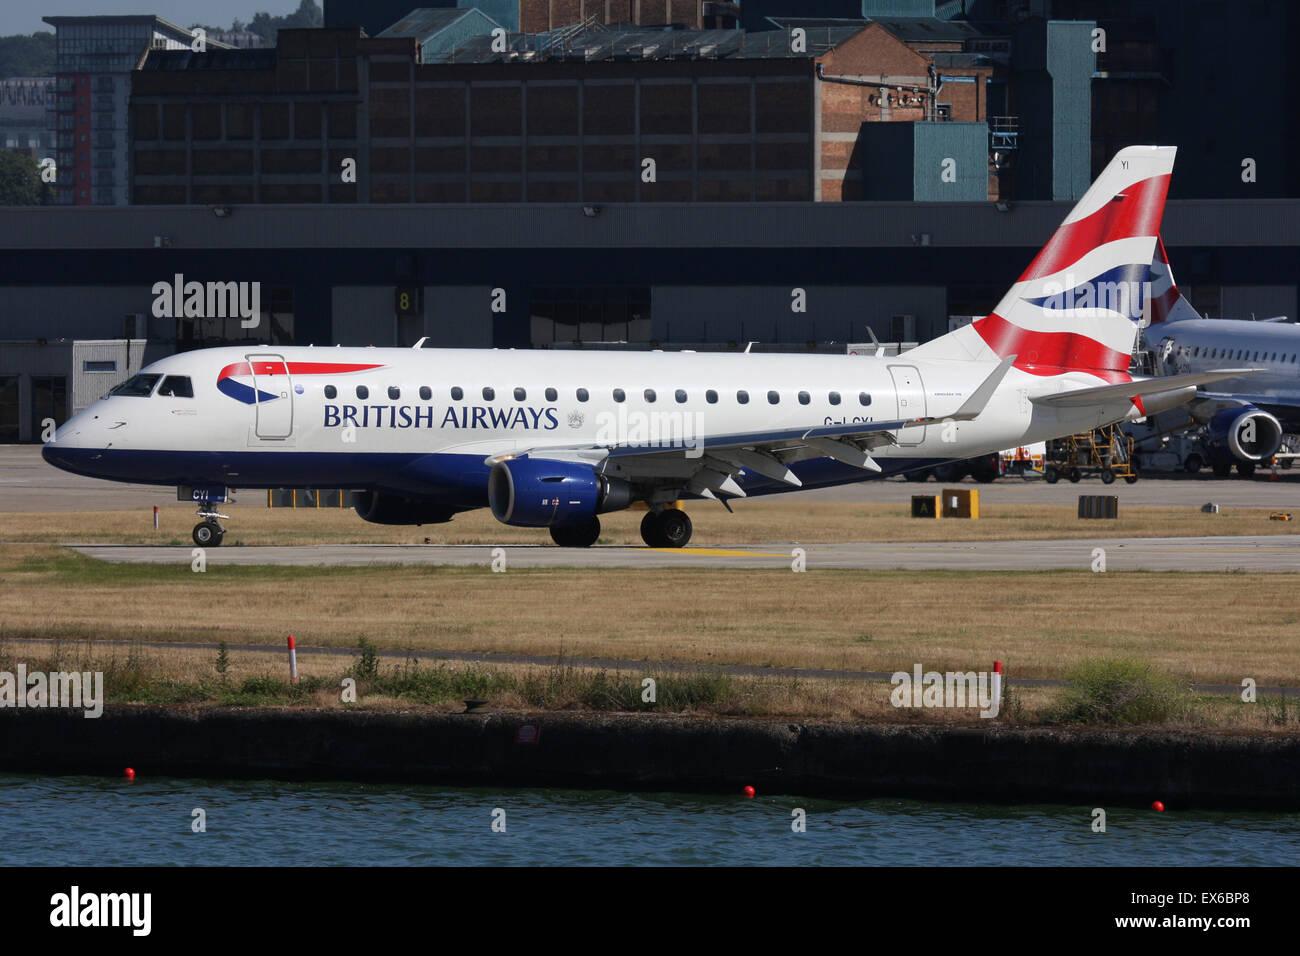 BRITISH AIRWAYS EMBRAER LONDON CITY DOCKLANDS - Stock Image